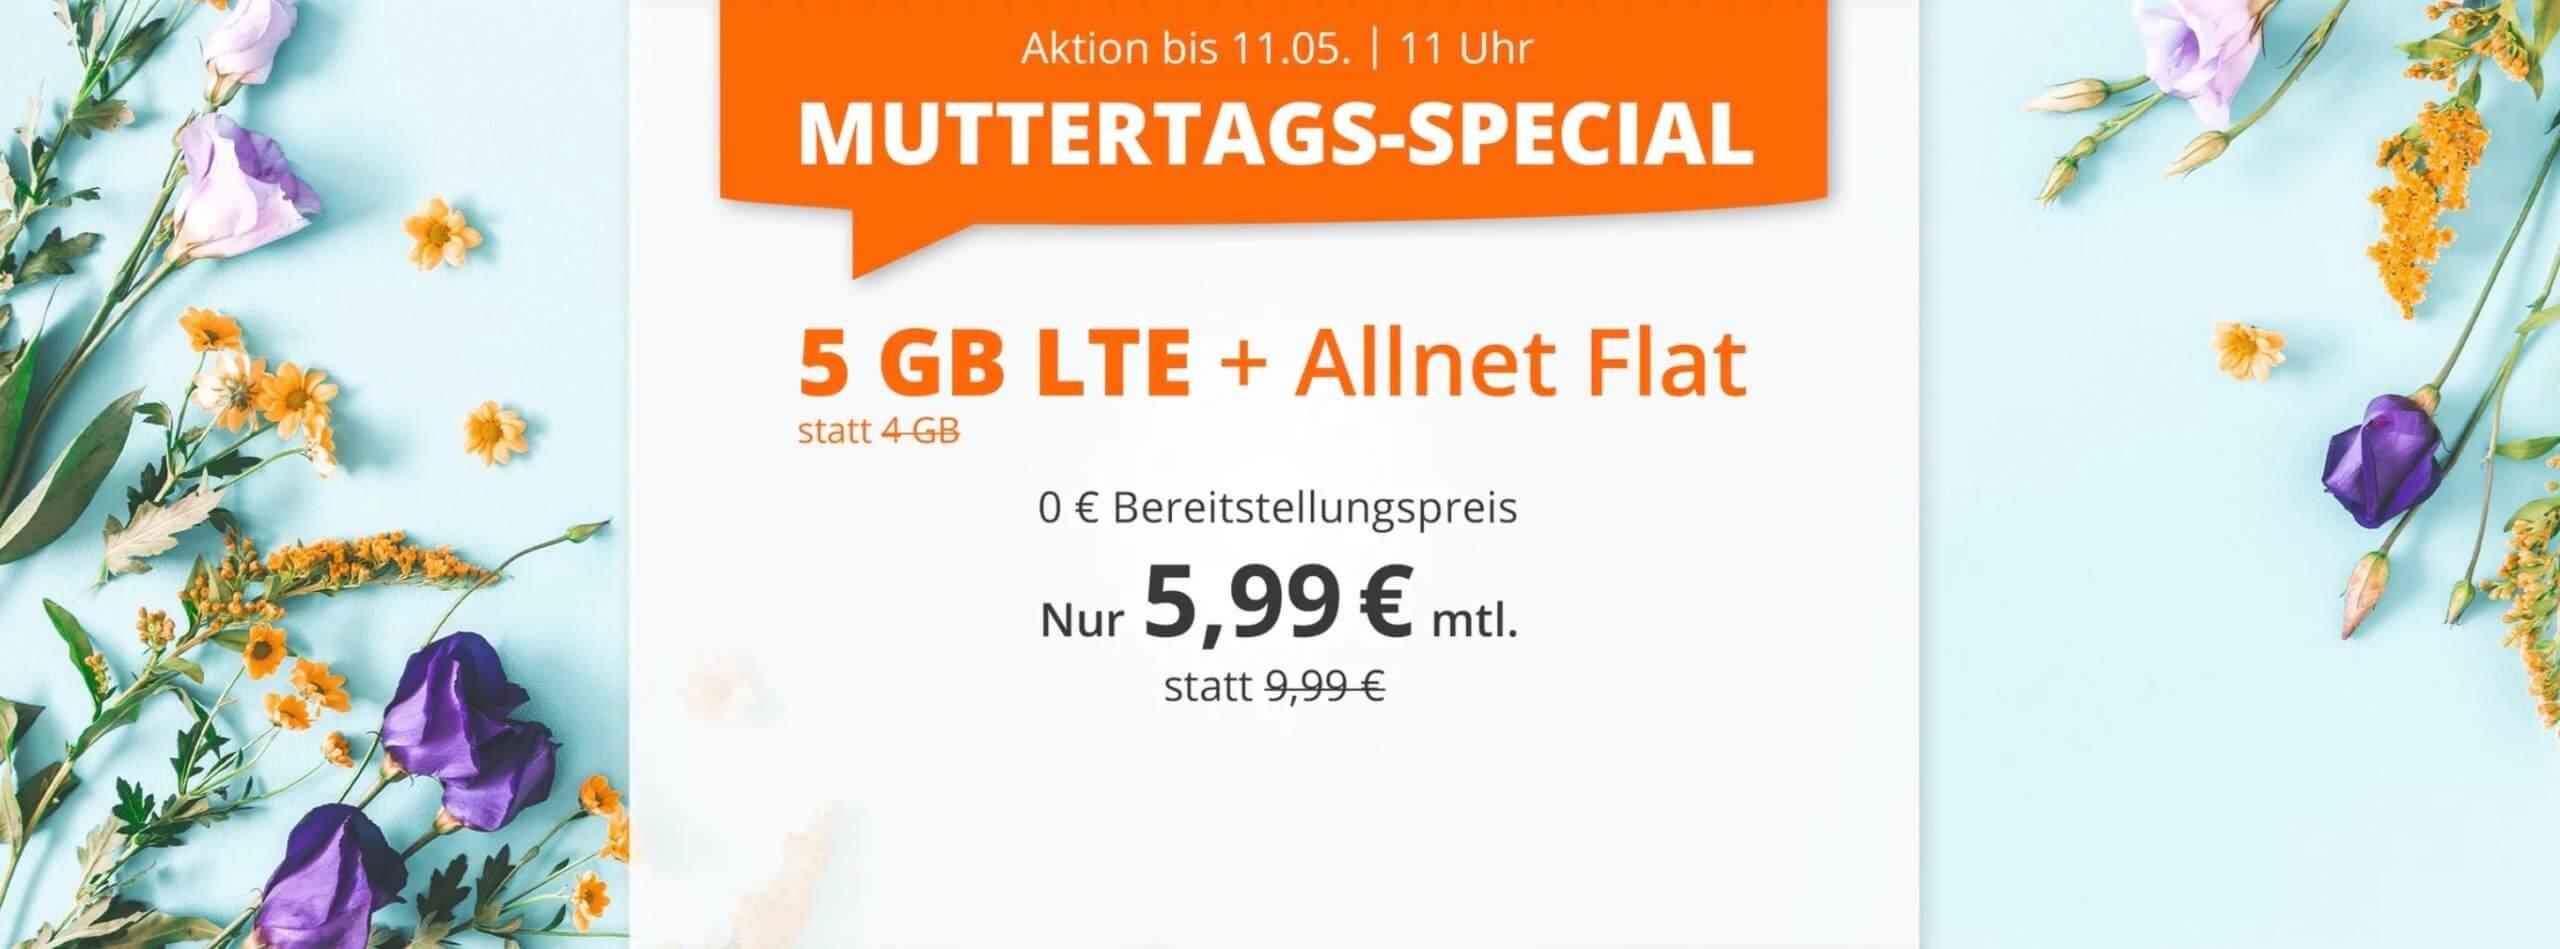 Tarifknaller-zum-Muttertag-5-GB-LTE-Allnet-Flat-f-r-nur-5-99-pro-Monat